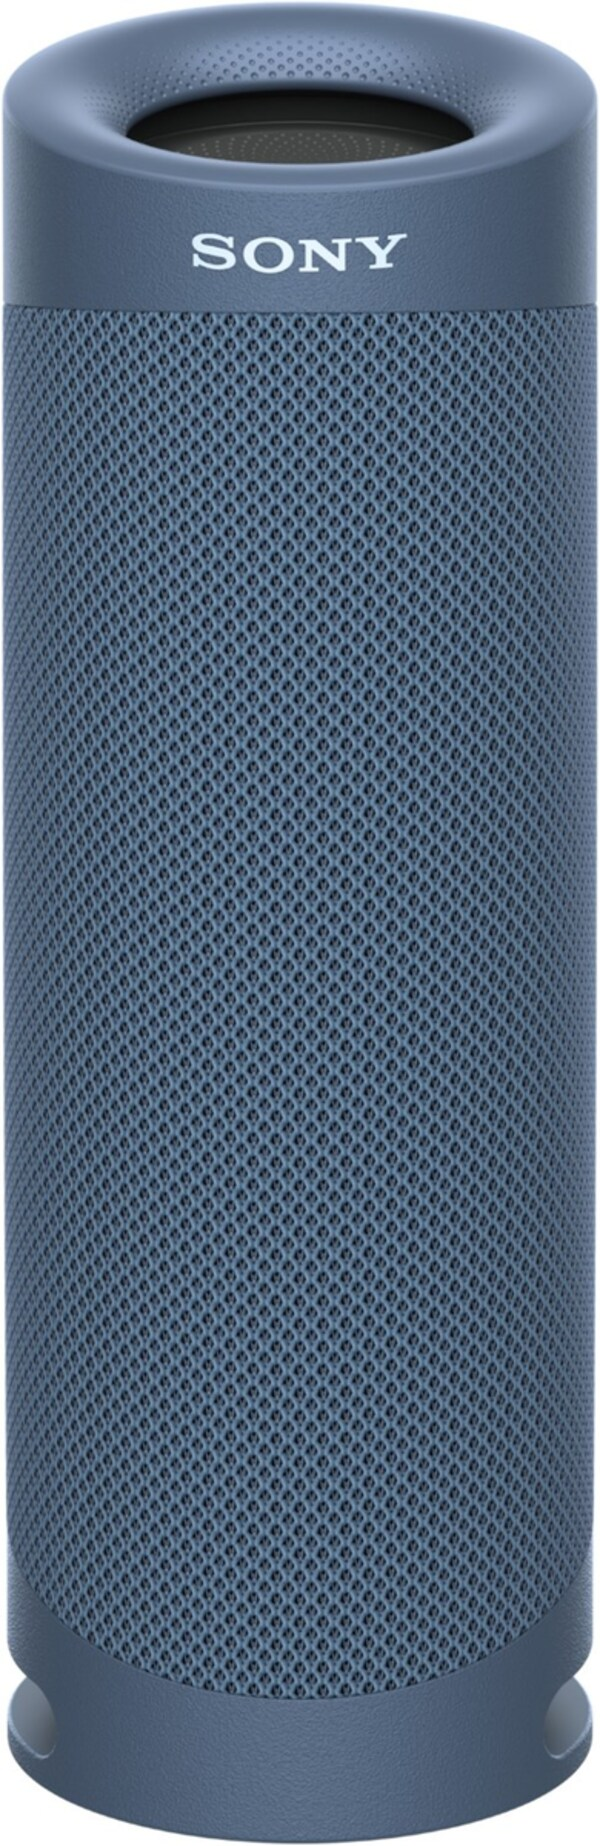 SRS-XB23L Multimedia-Lautsprecher blau